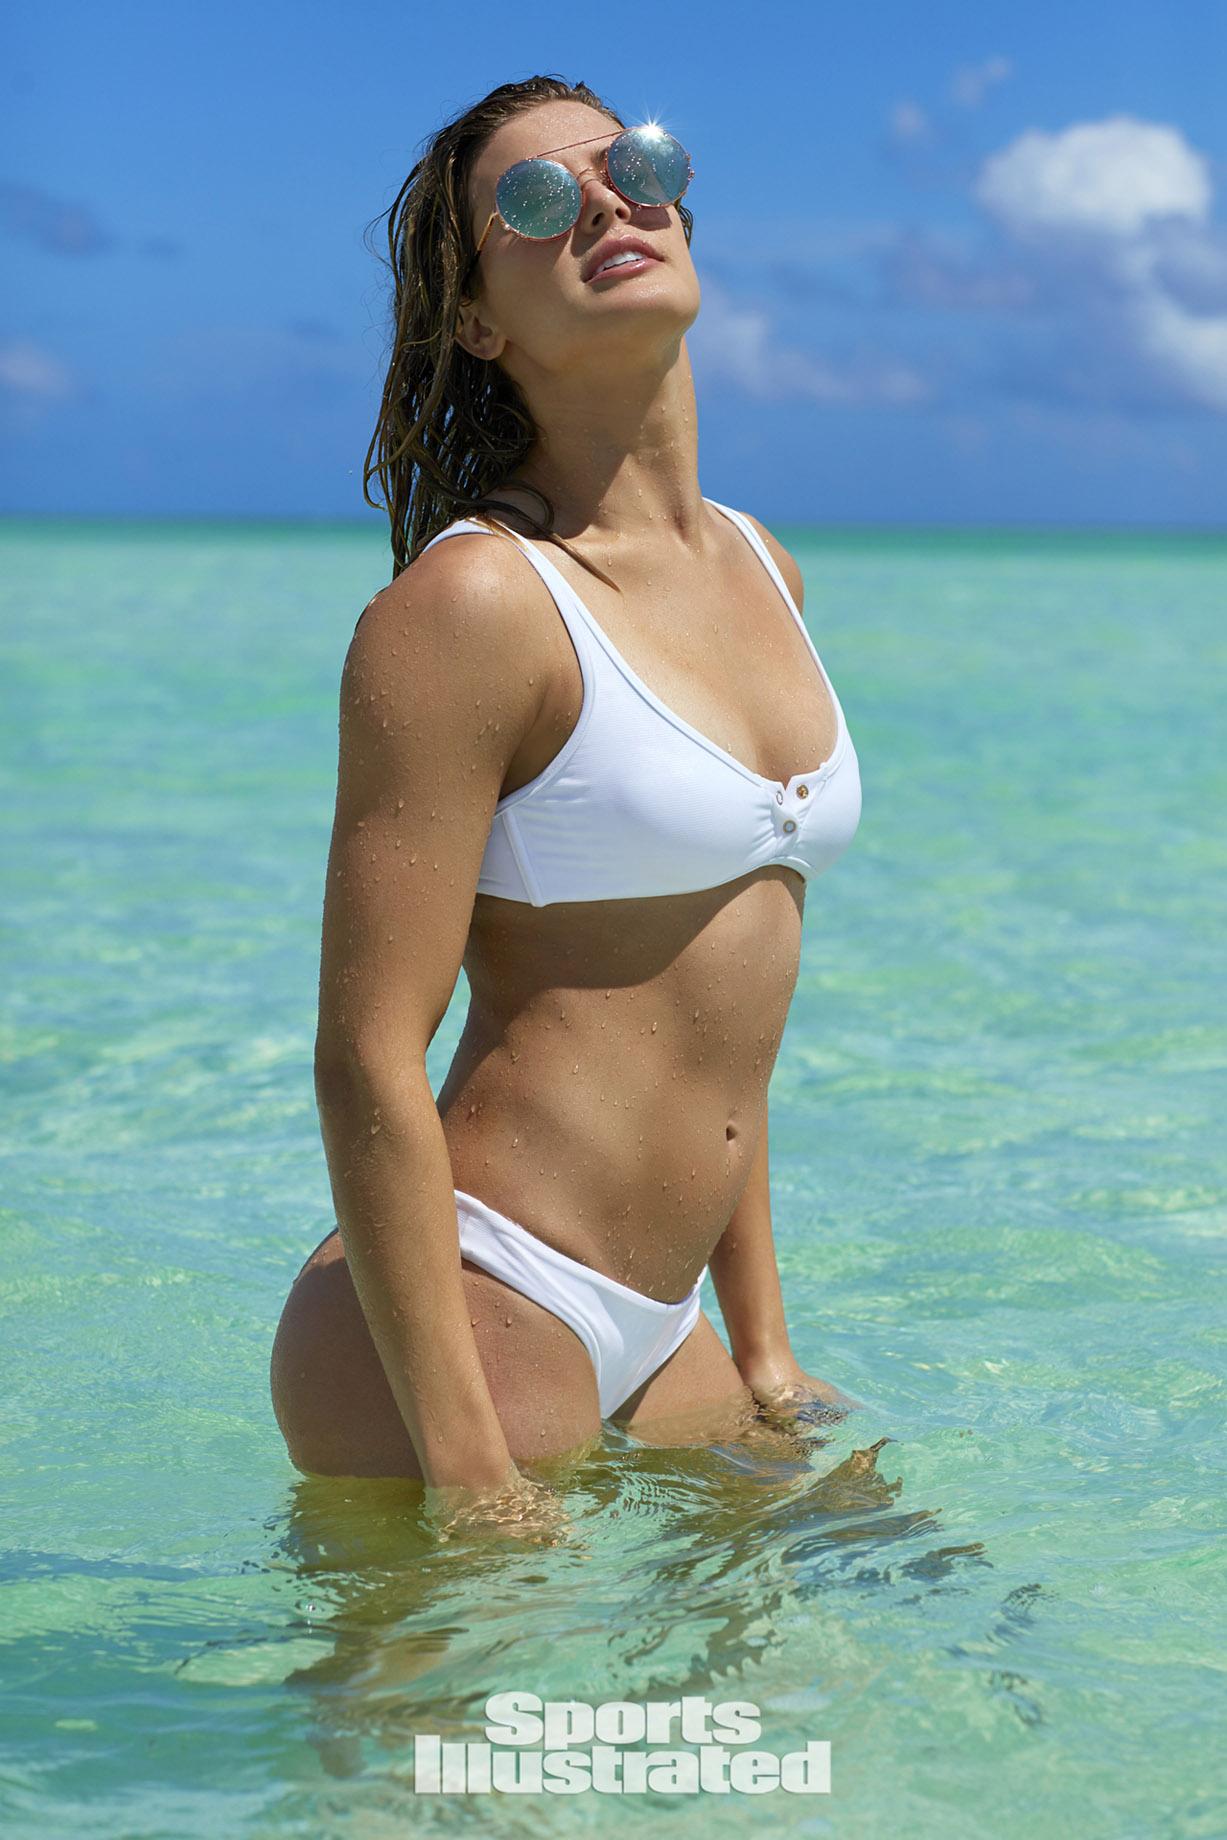 Genie Bouchard / Жени Бушар в купальниках из новой коллекции Sports Illustrated Swimsuit 2017 issue / in Turks & Caicos by Emmanuelle Hauguel